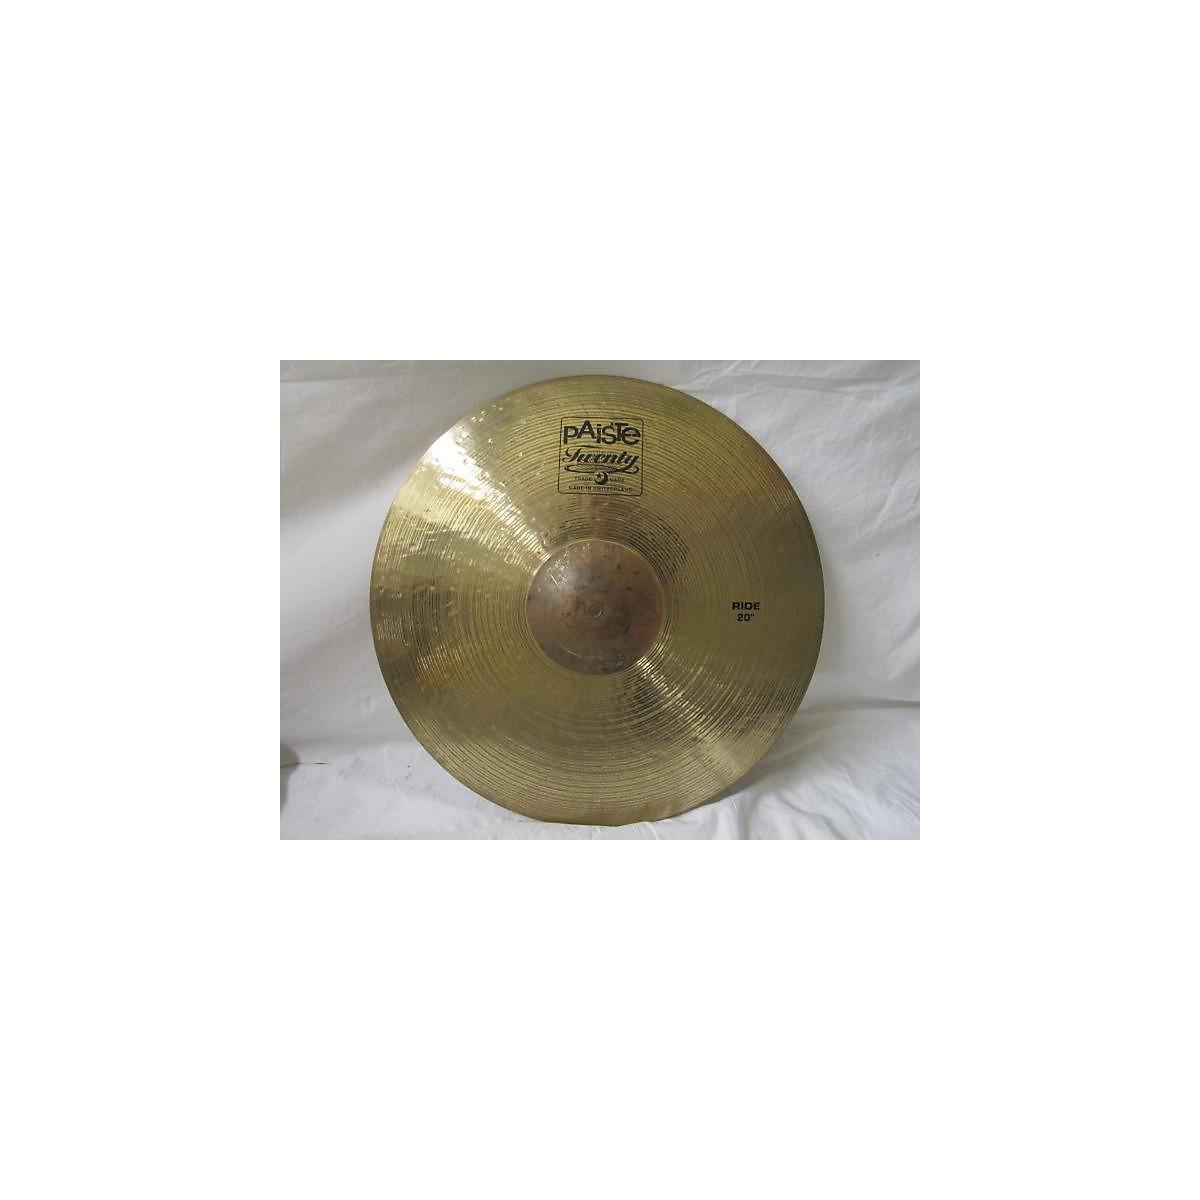 Paiste 20in Twenty Series Ride Cymbal